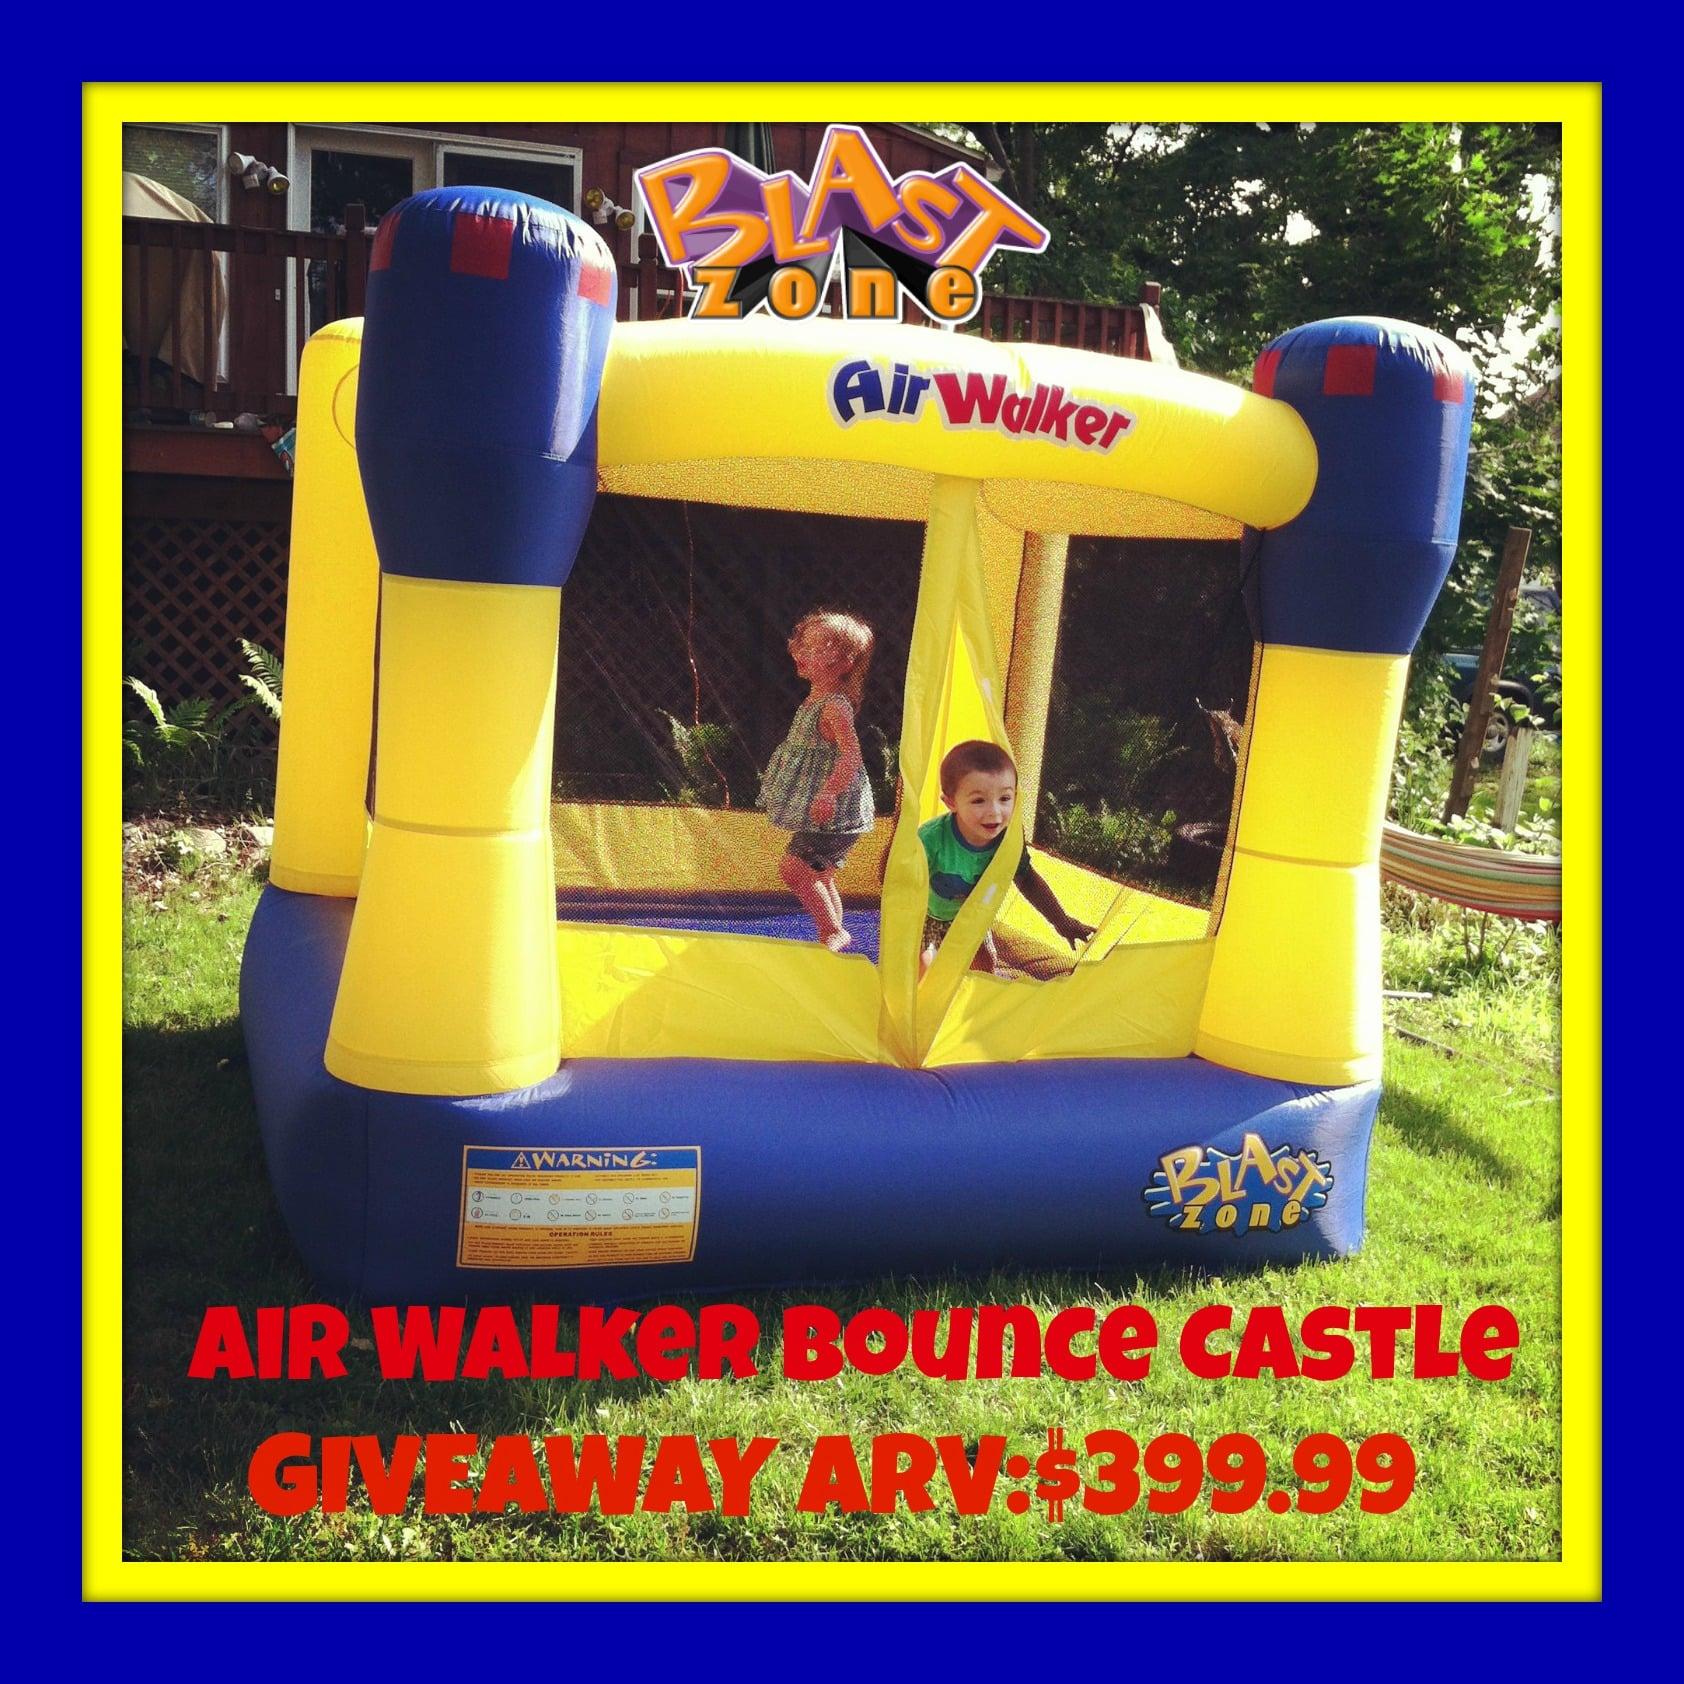 Sensational Enter To Win A Blast Zone Air Walker Bounce Castle Win Download Free Architecture Designs Scobabritishbridgeorg